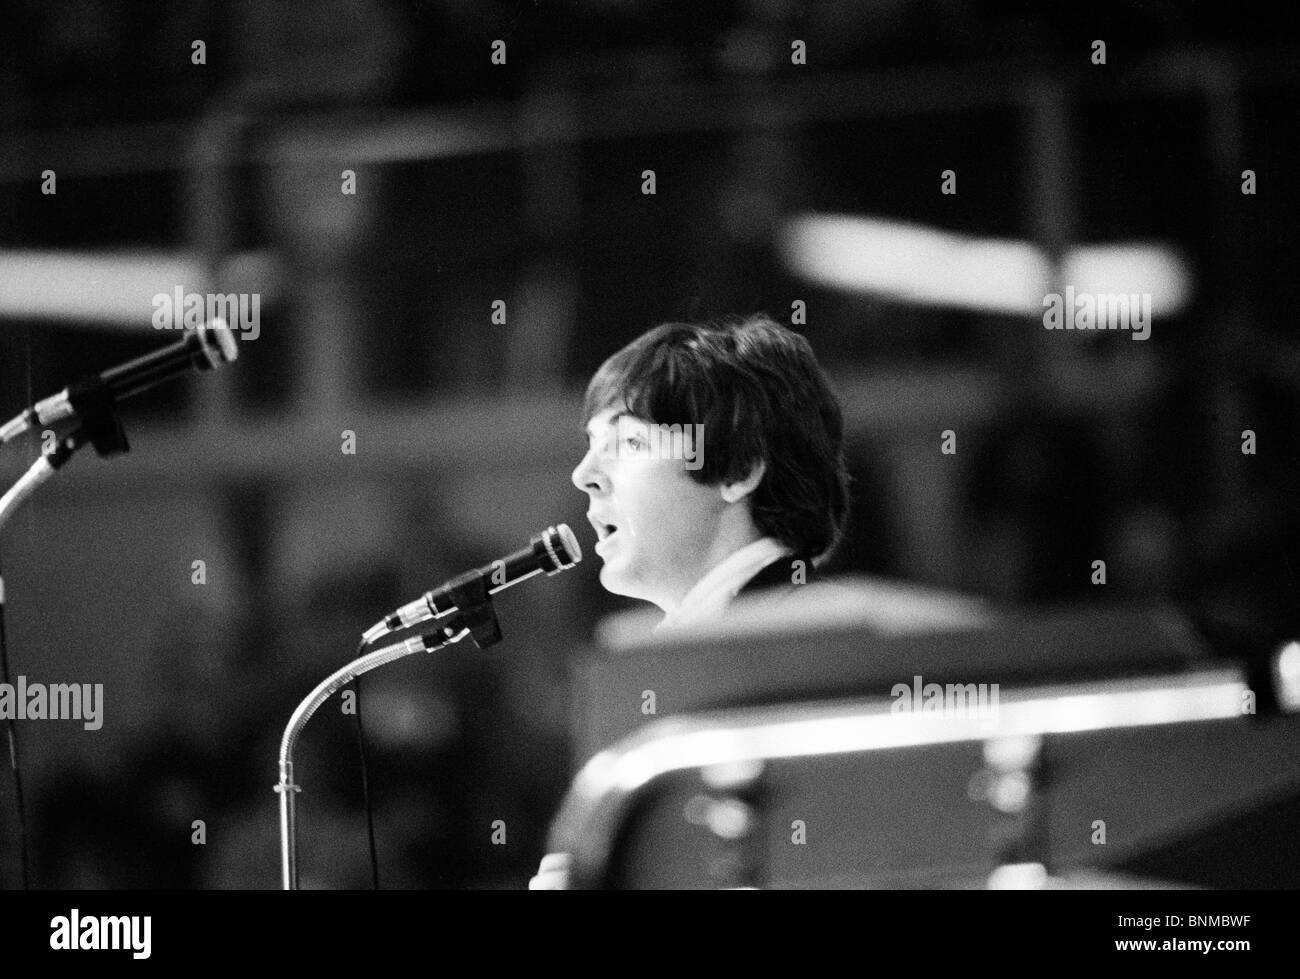 The Beatles music pop group band concert Germany Essen 1966 Paul McCartney singer - Stock Image